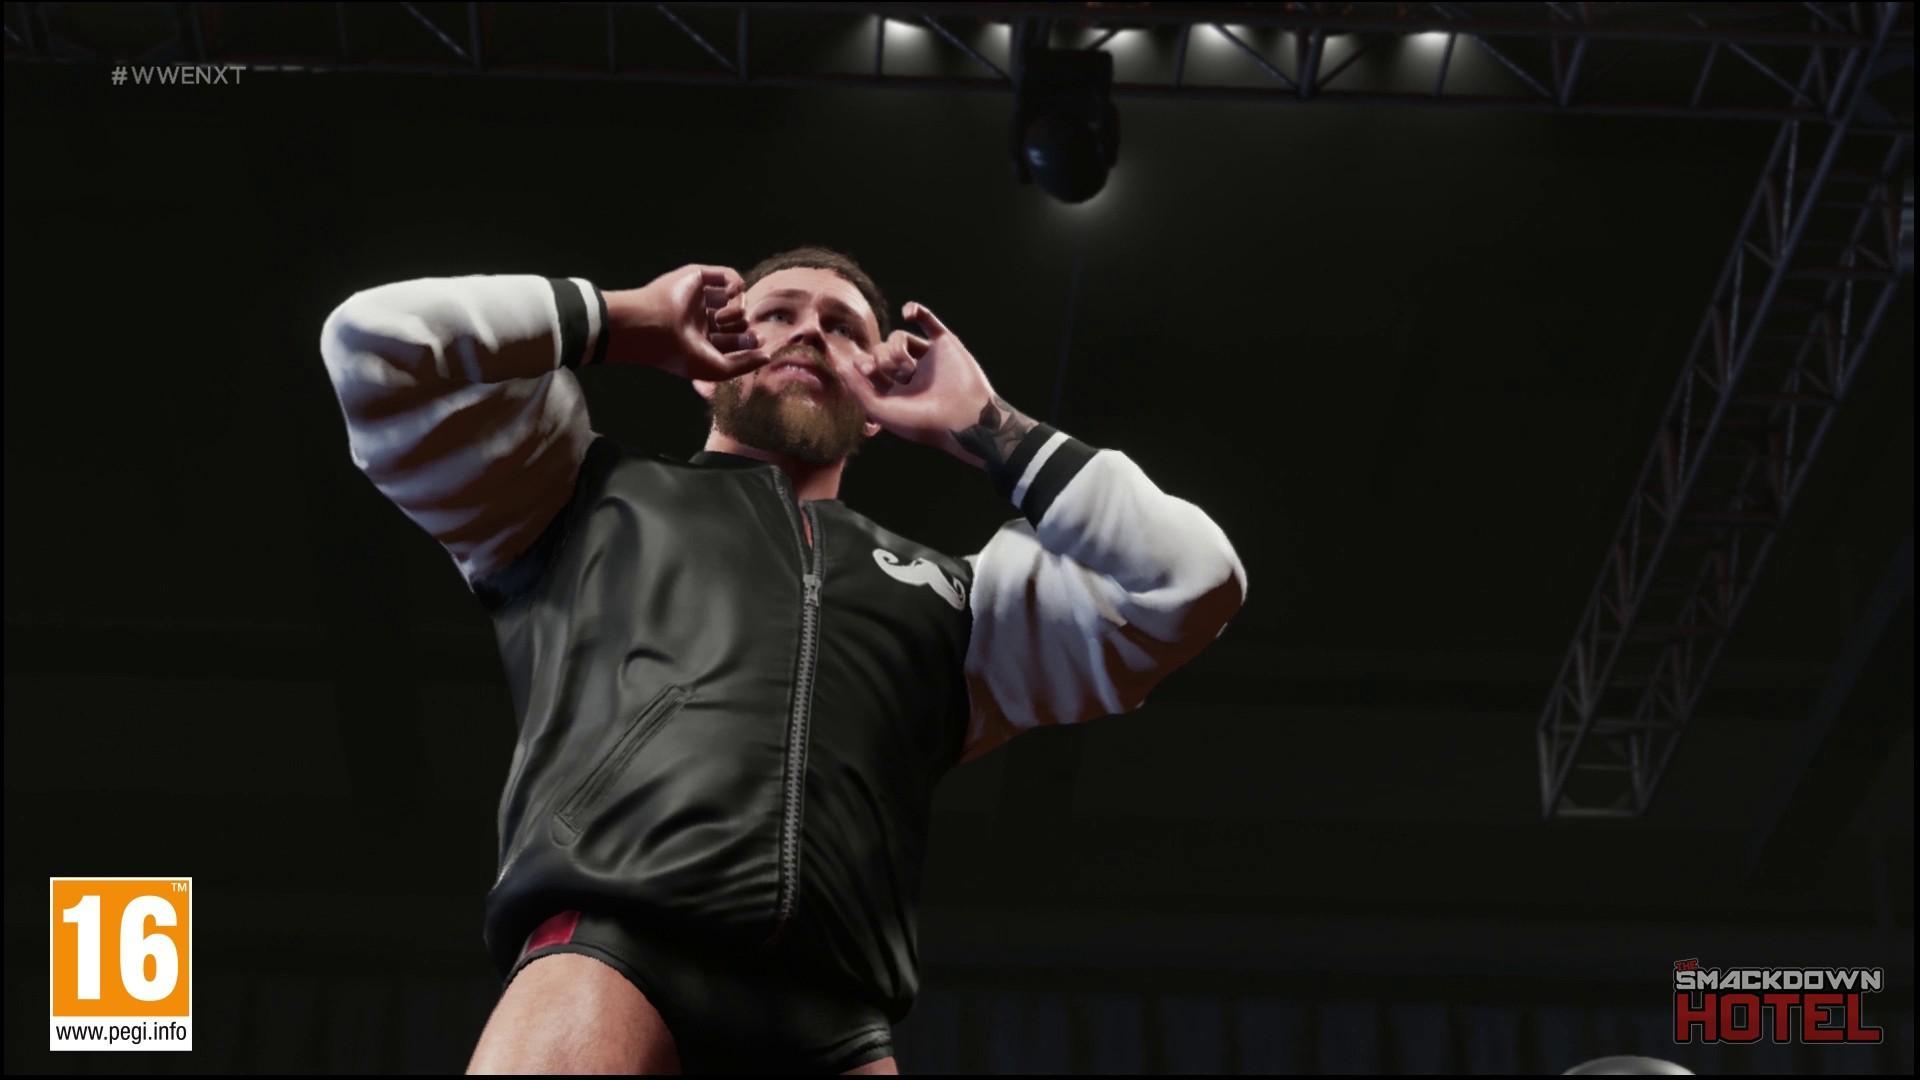 WWE 2K19 : Pete Dunne & Tyler Bate - Entrées + screenshots  WWE_2K19_TylerBate_3-15330-1080